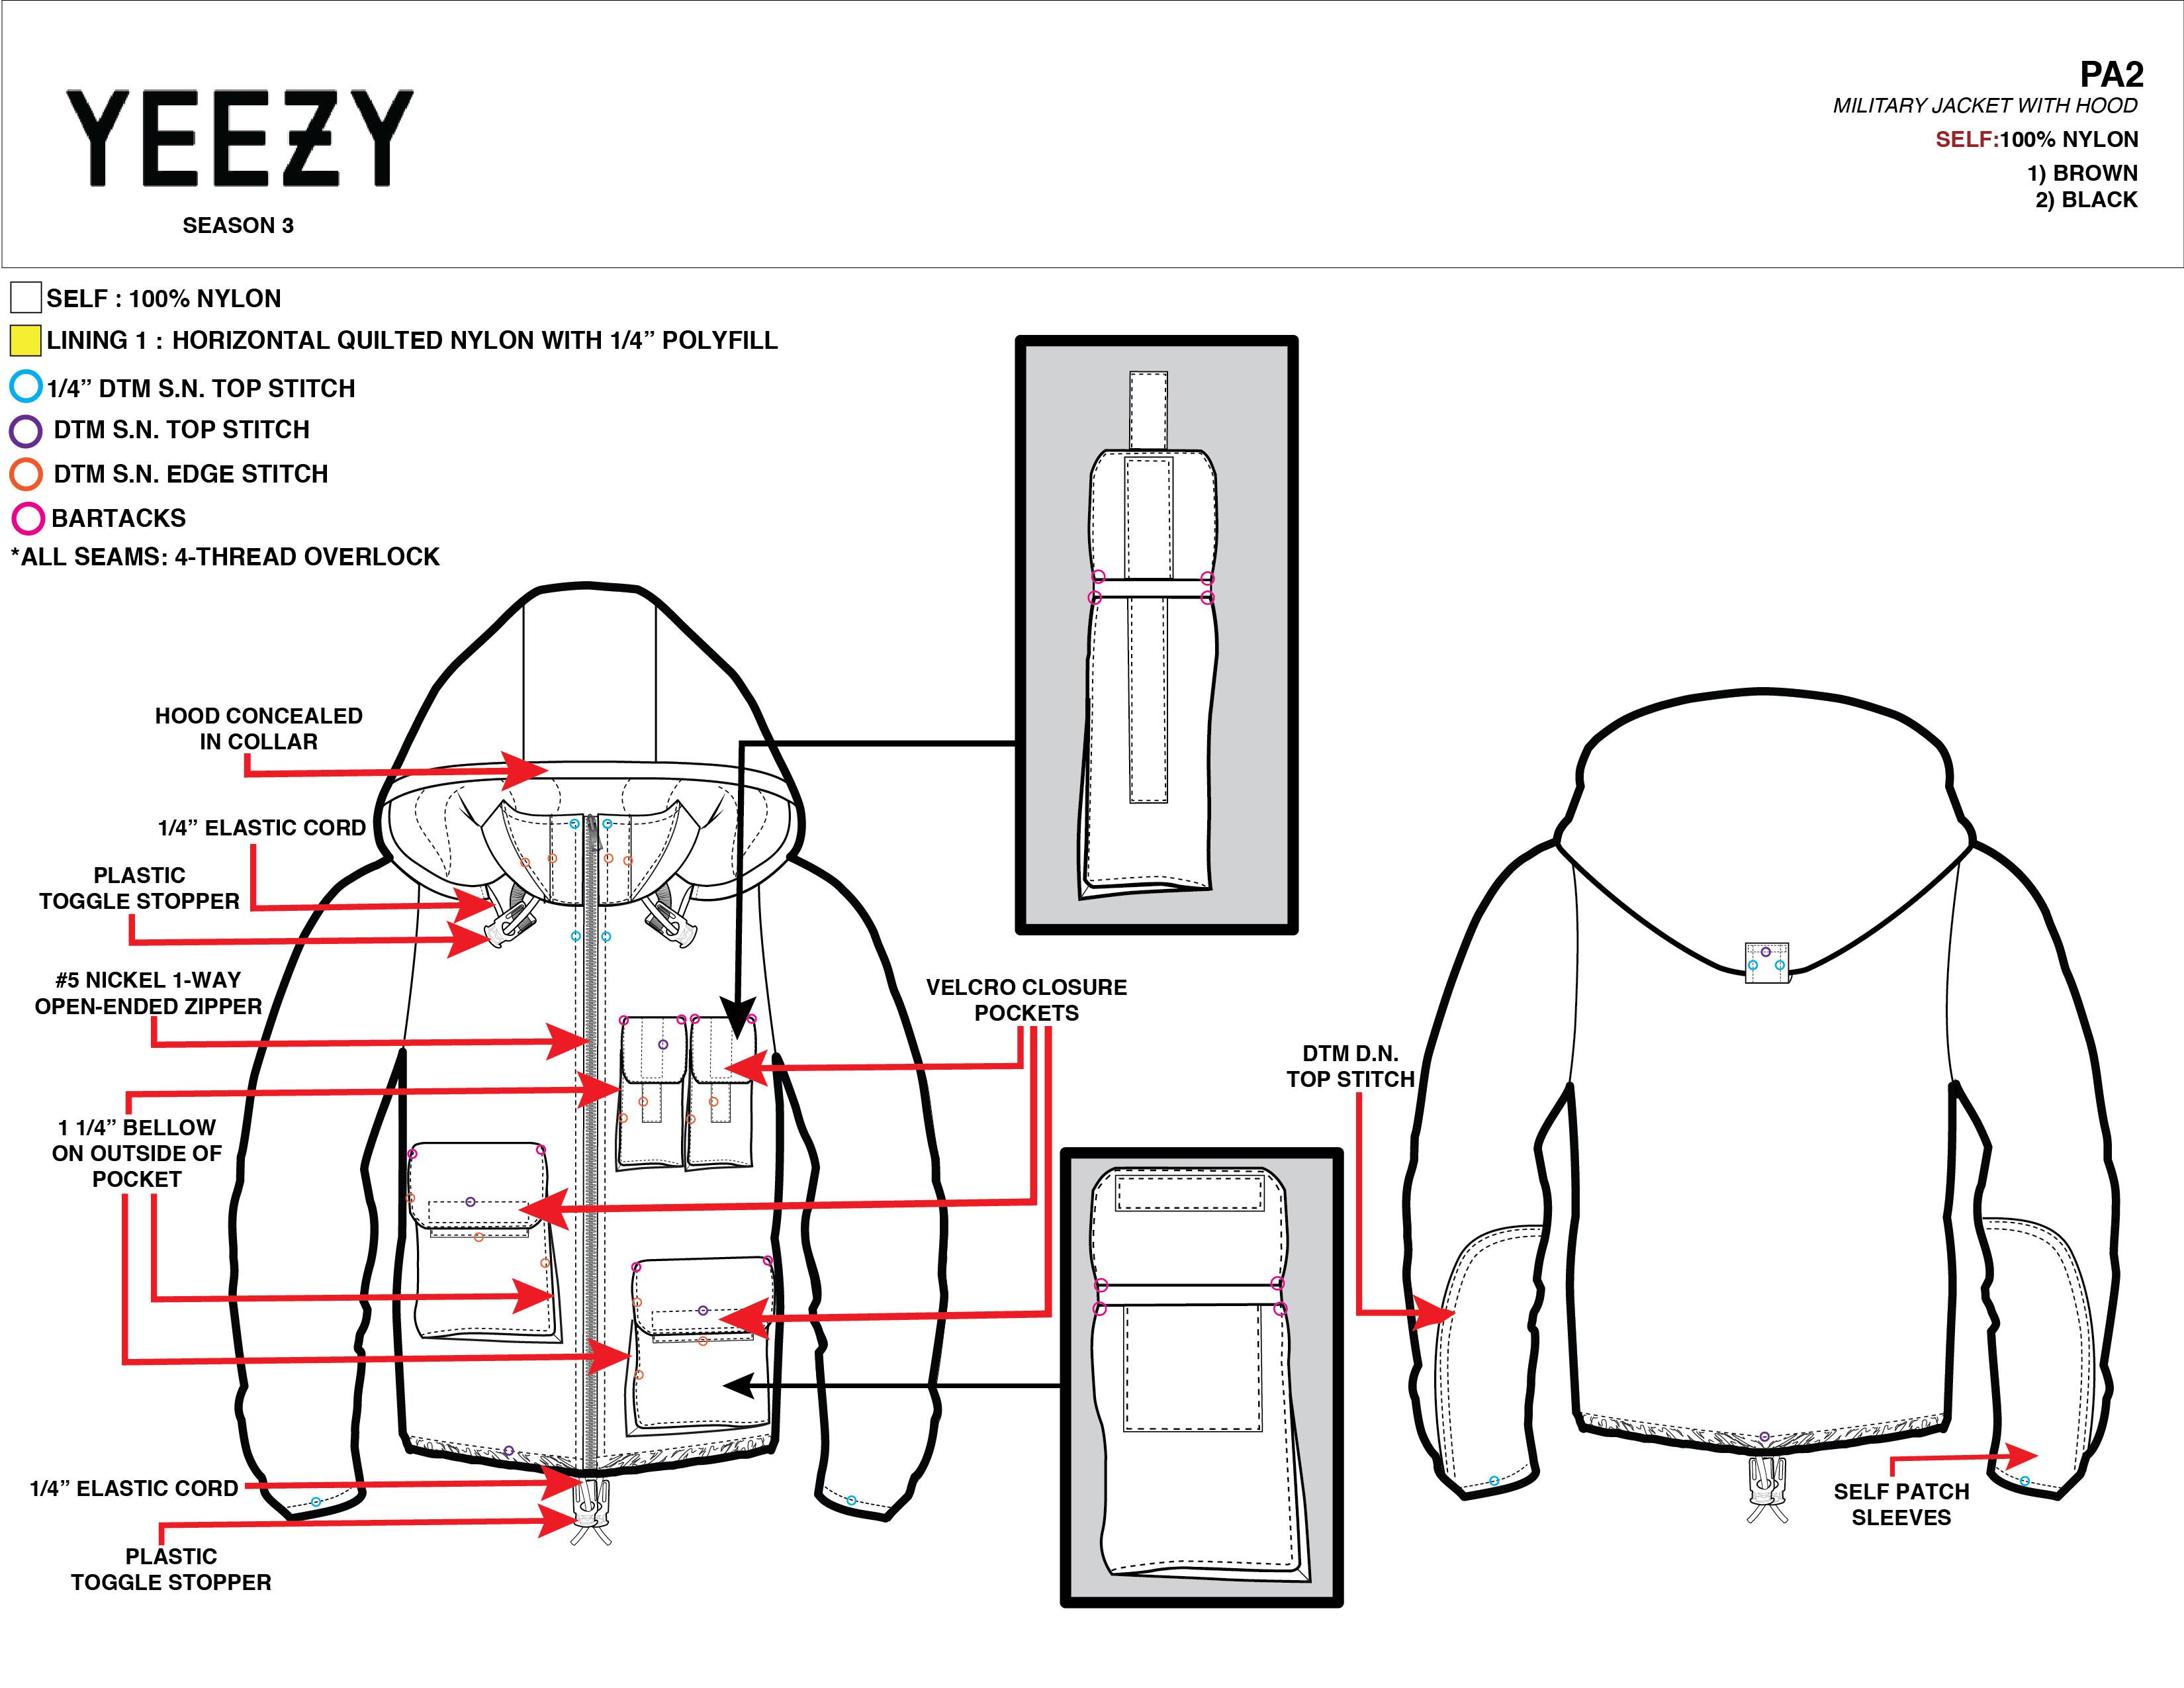 2_ALFRED_LAPE_YEEZY_KANYE_WEST.jpg